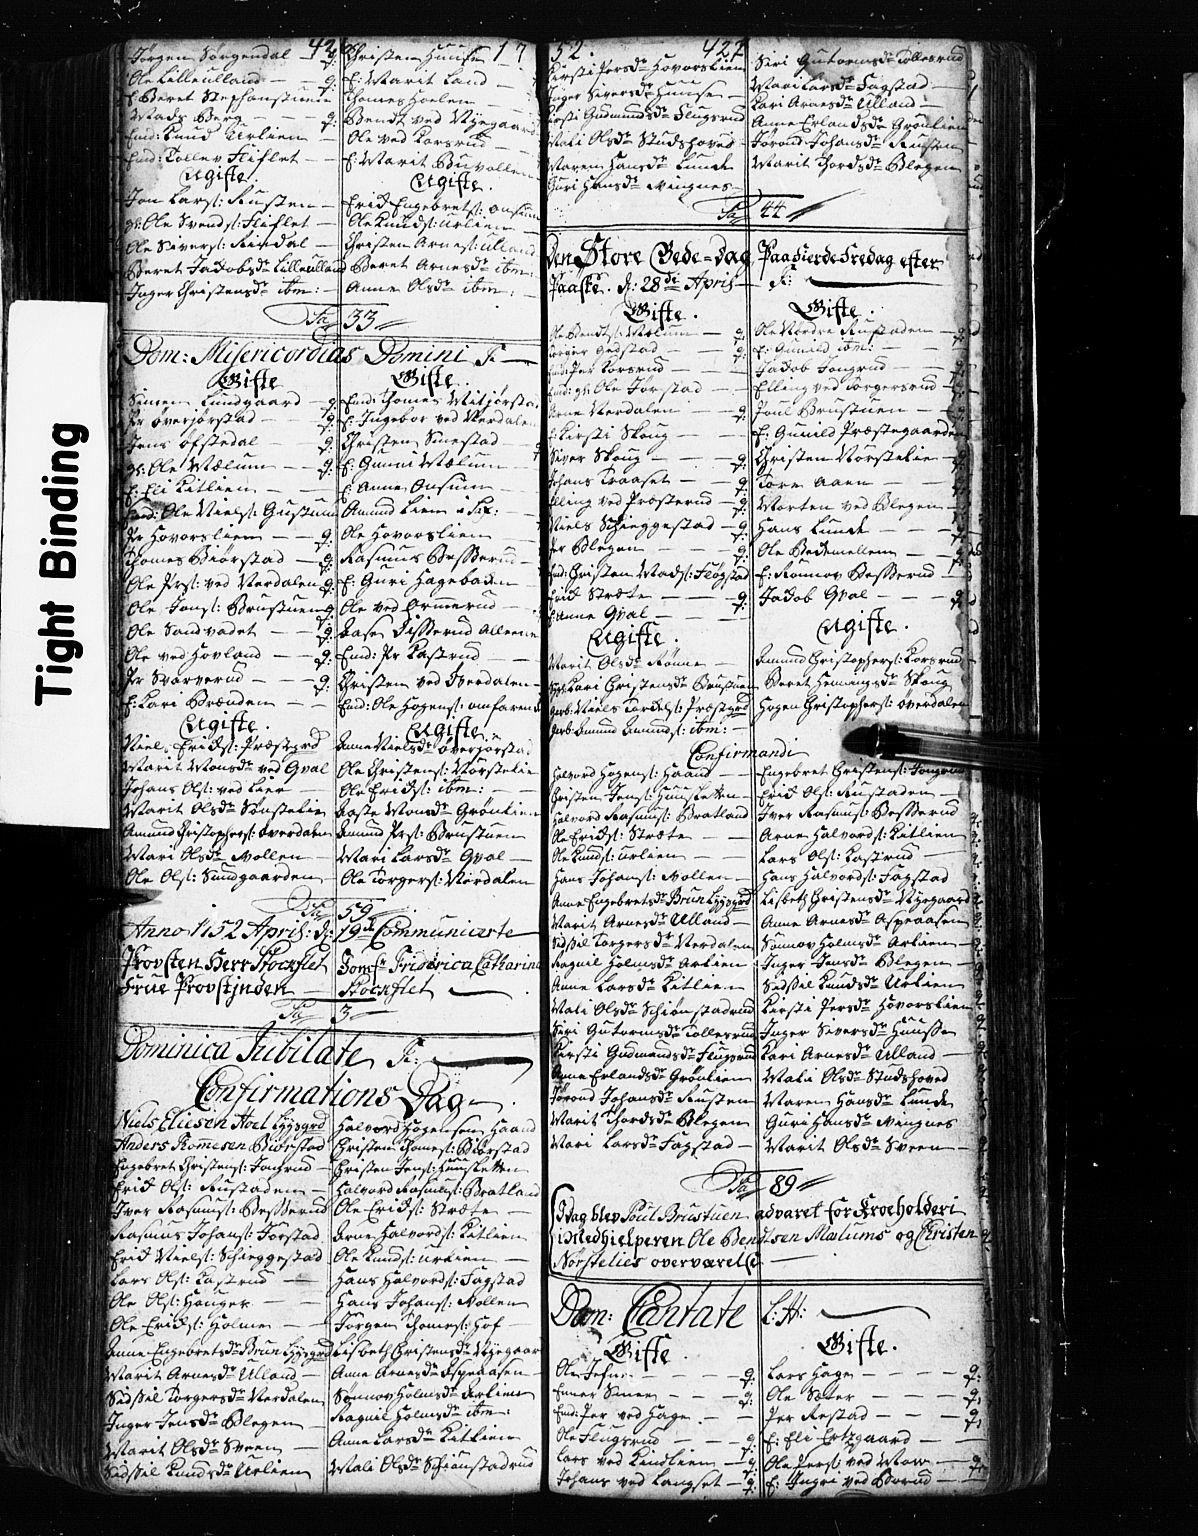 SAH, Fåberg prestekontor, Klokkerbok nr. 2, 1741-1756, s. 426-427